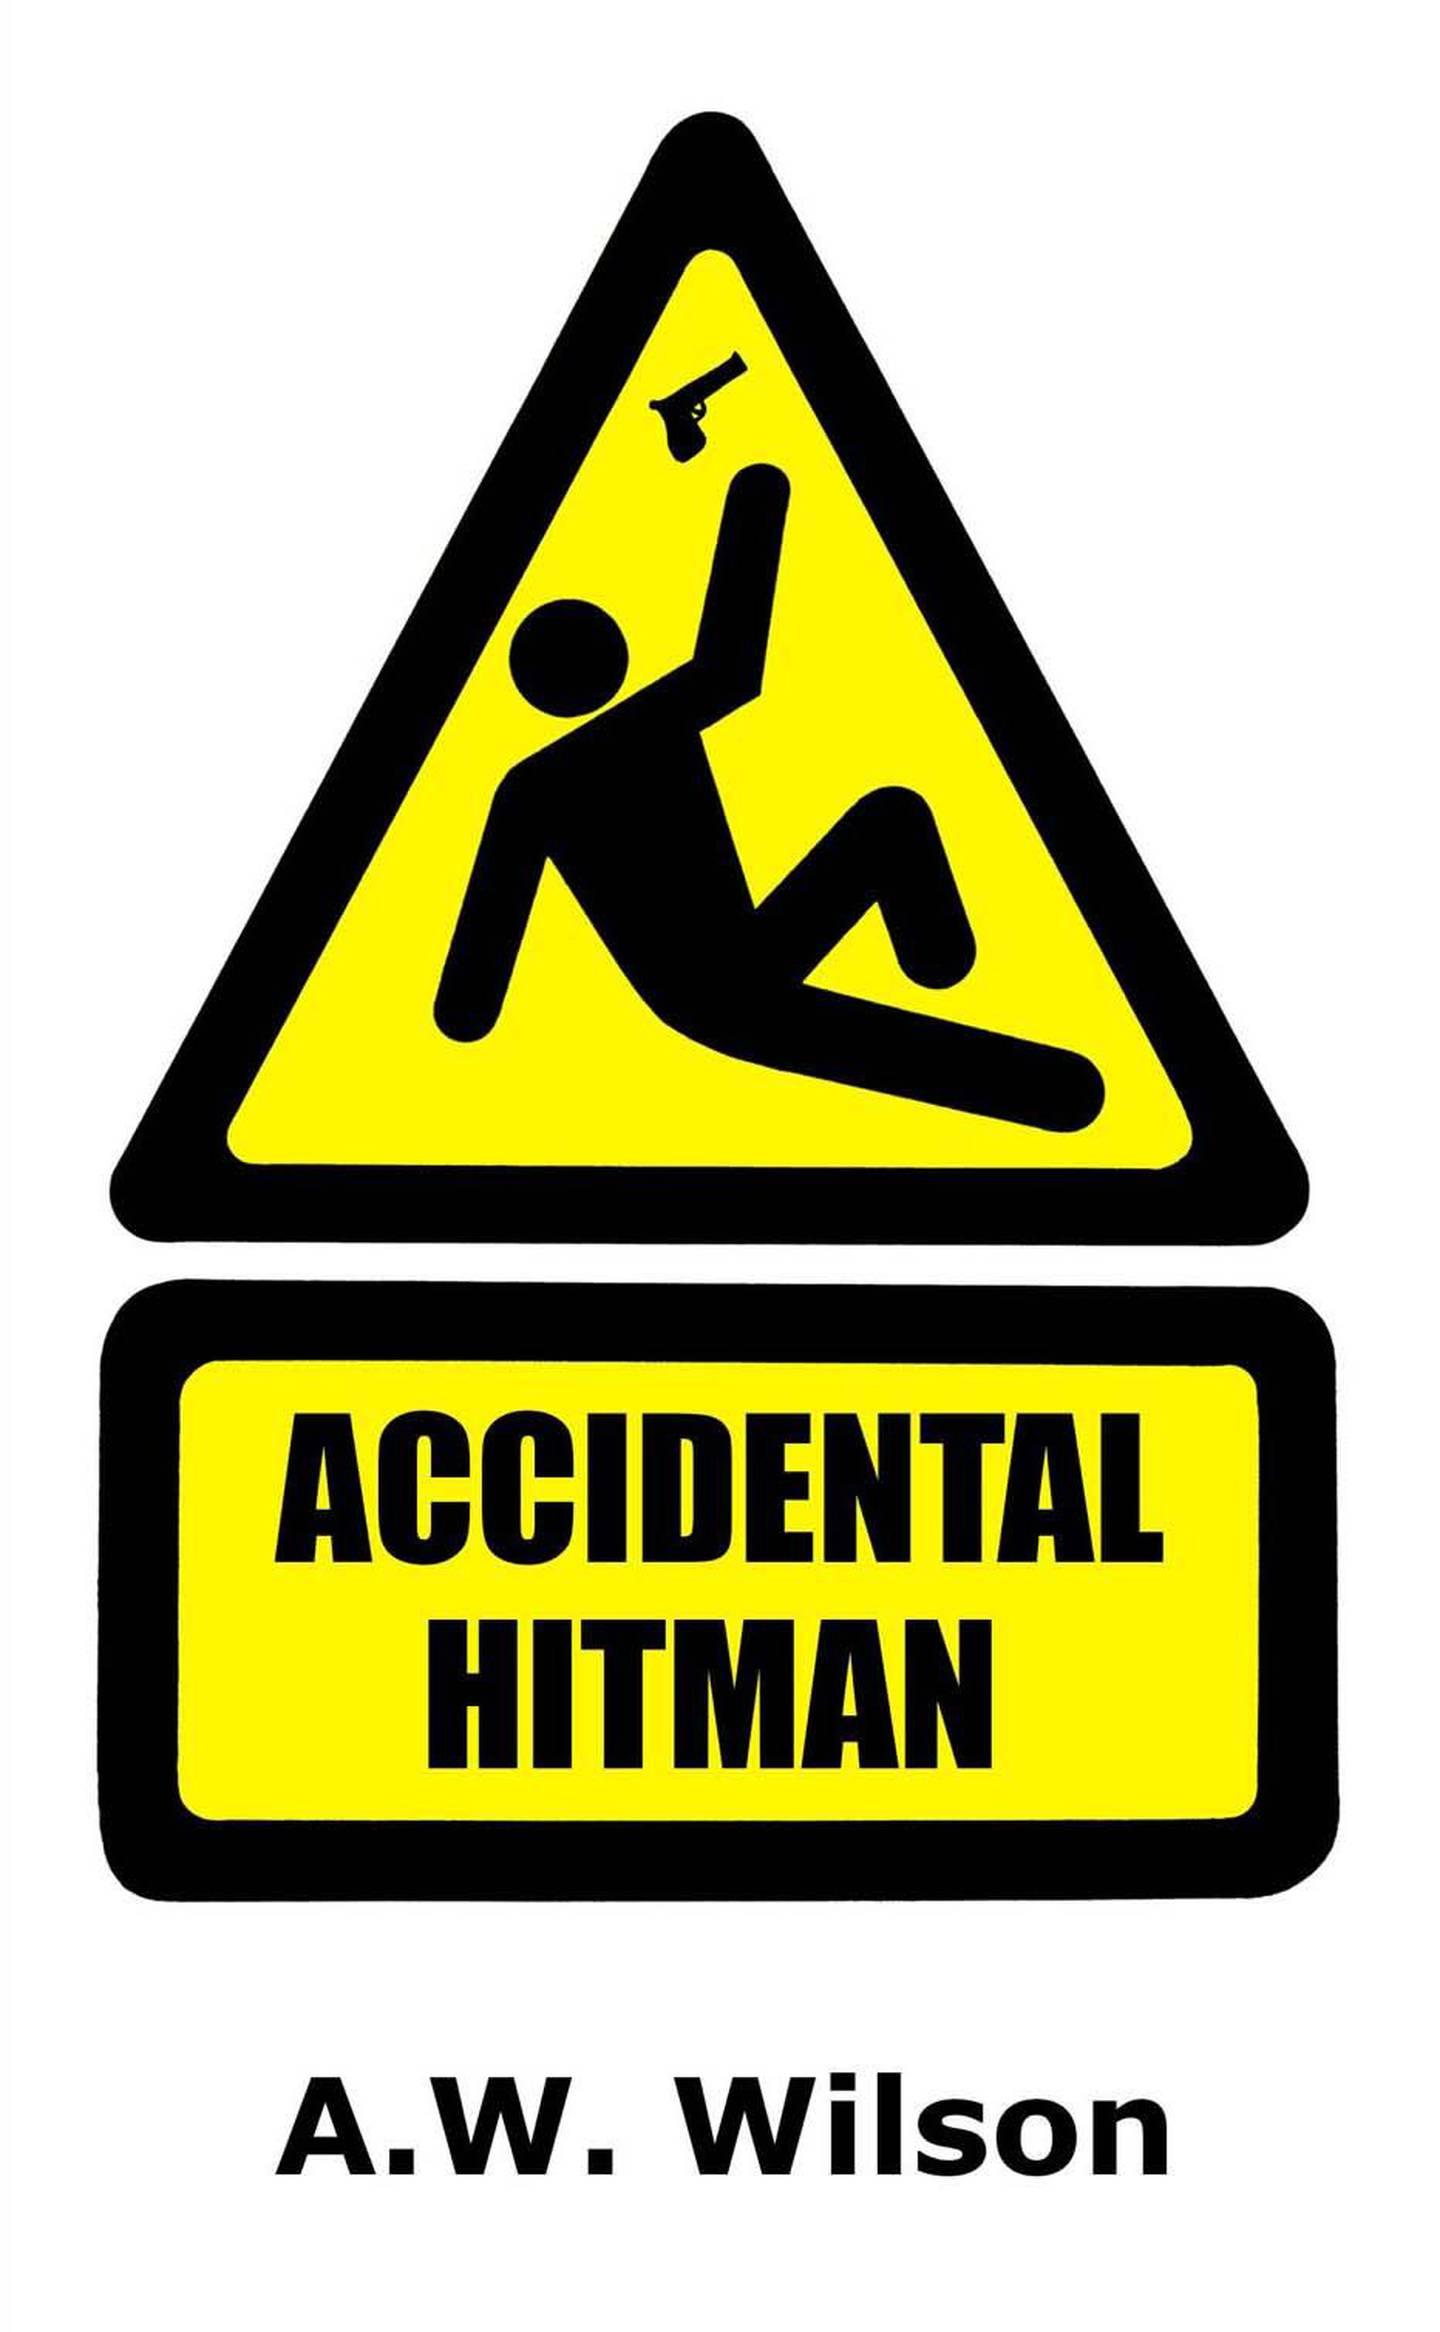 Accidental Hitman by A W Wilson. Courtesy A W Wilson